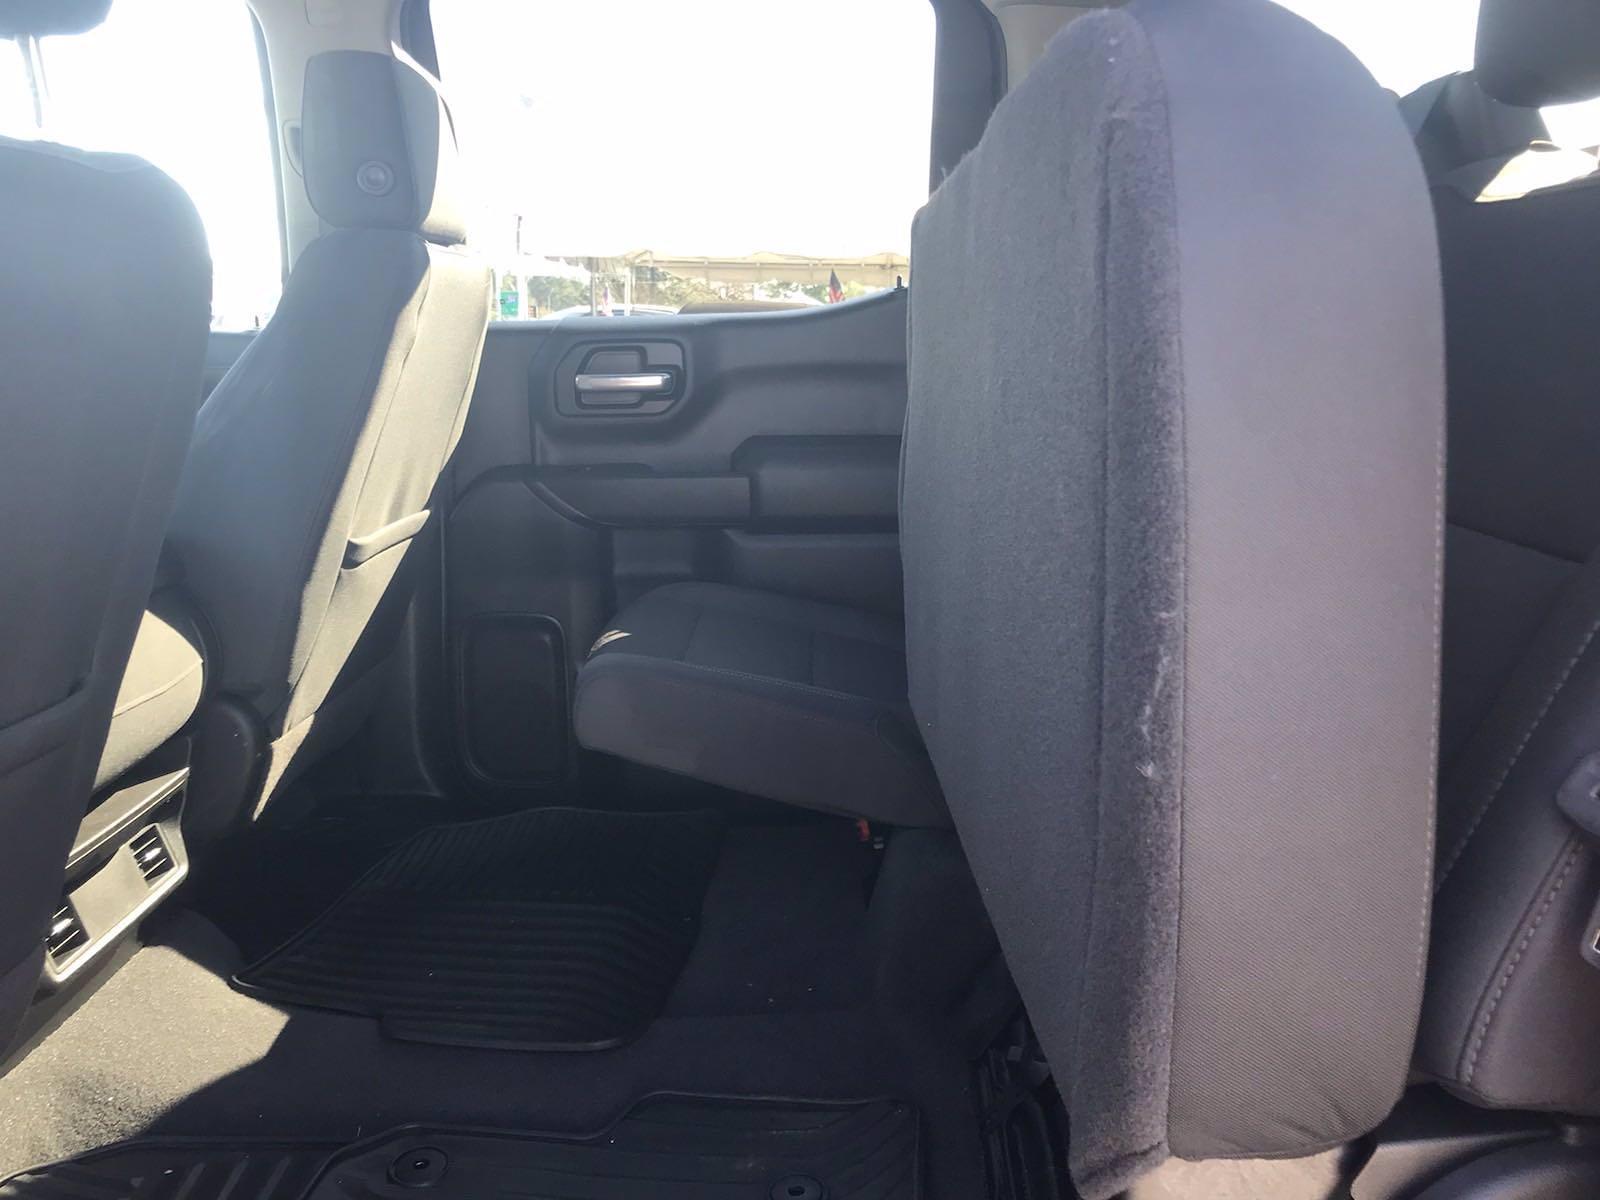 2020 Chevrolet Silverado 1500 Crew Cab 4x2, Pickup #16454P - photo 43